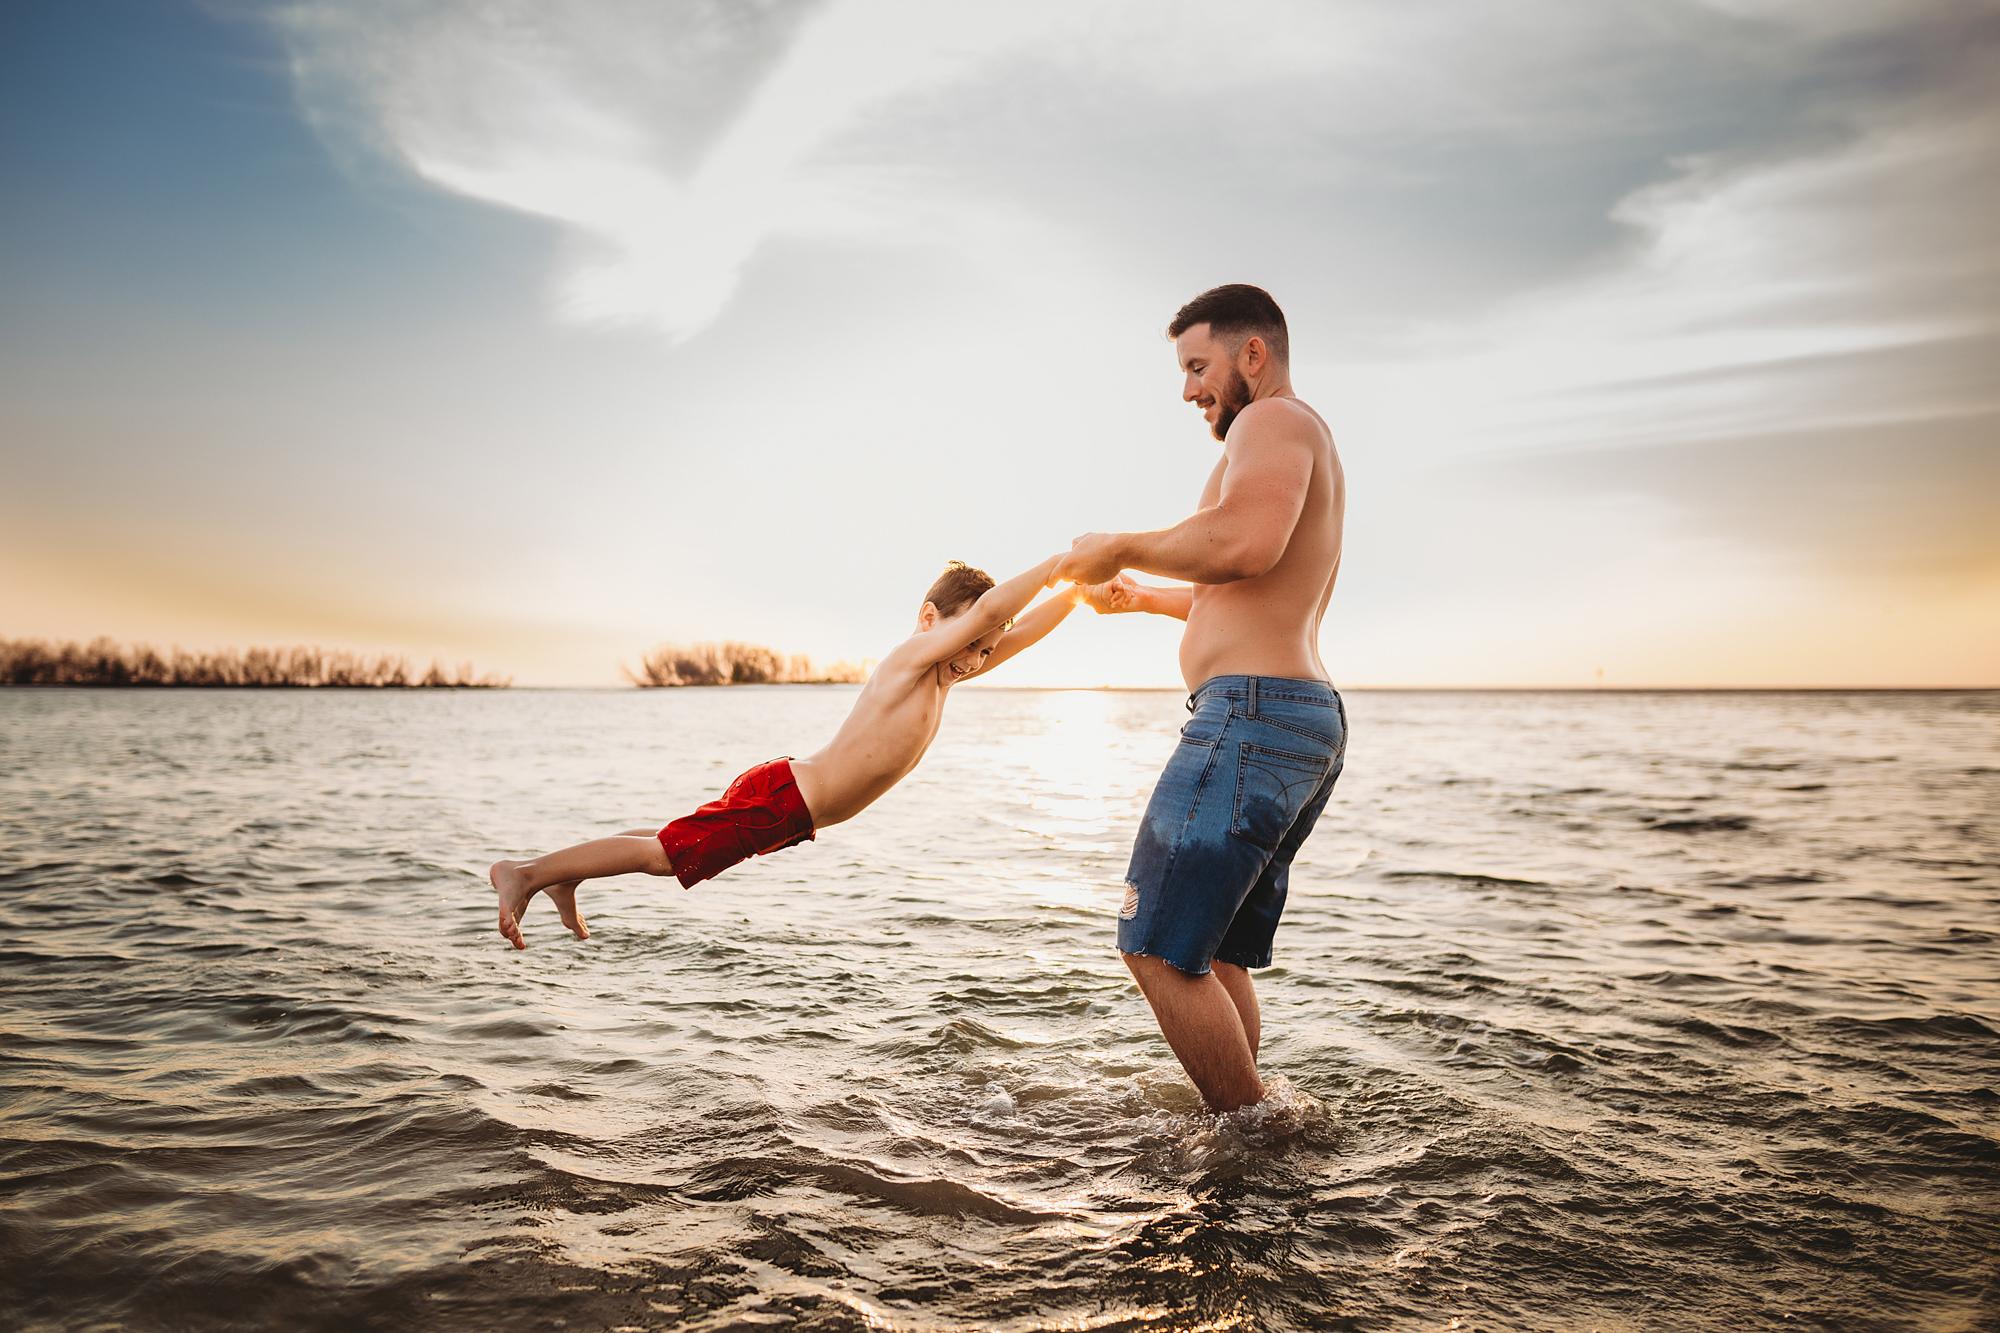 epic beach photographer, lifestyle family photographer tampa